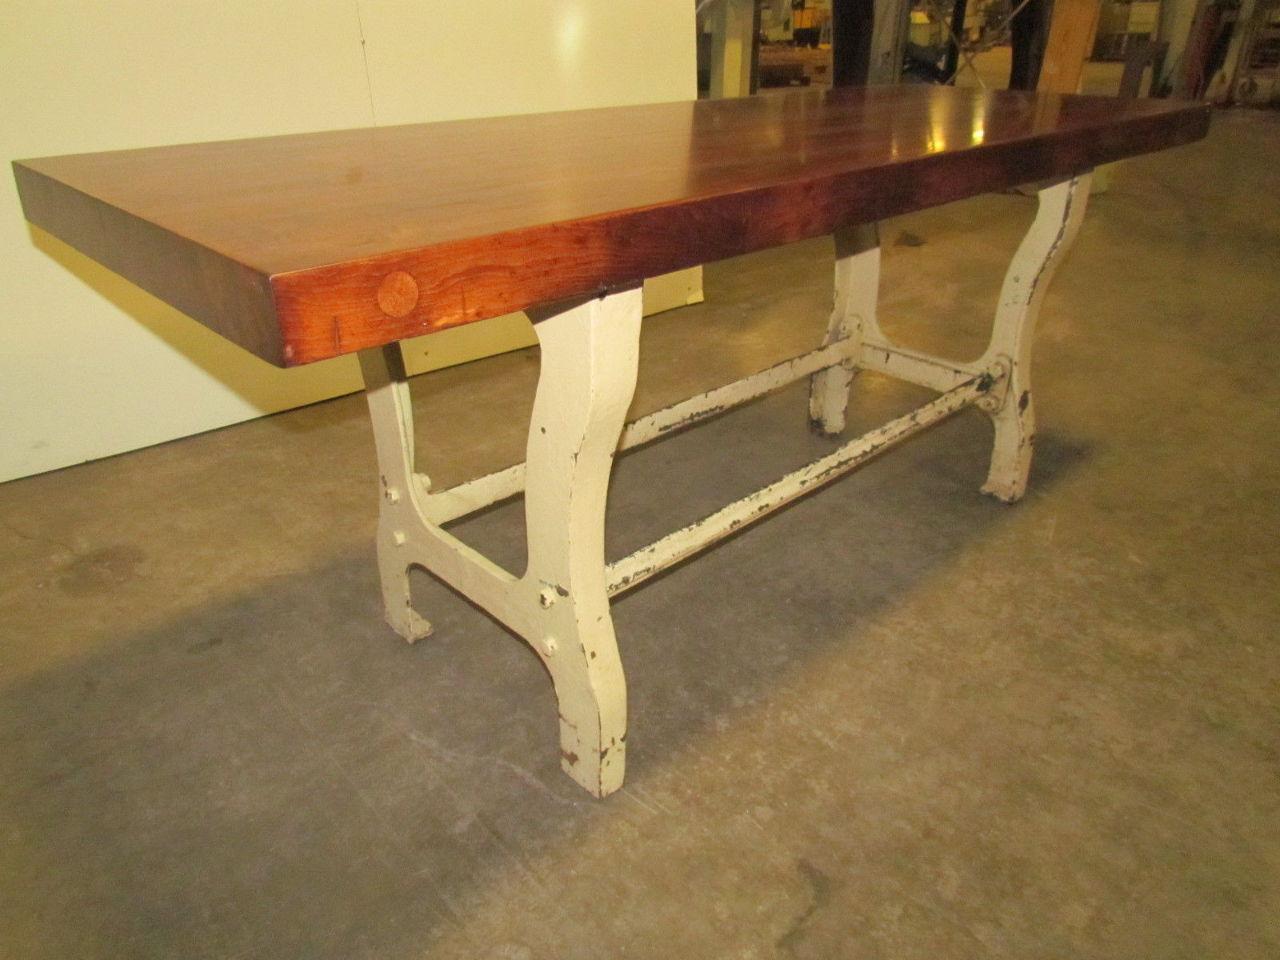 Vintage antique industrial 3 butcher block dining kitchen table cast iron legs ebay - Butcher block kitchen table set ...